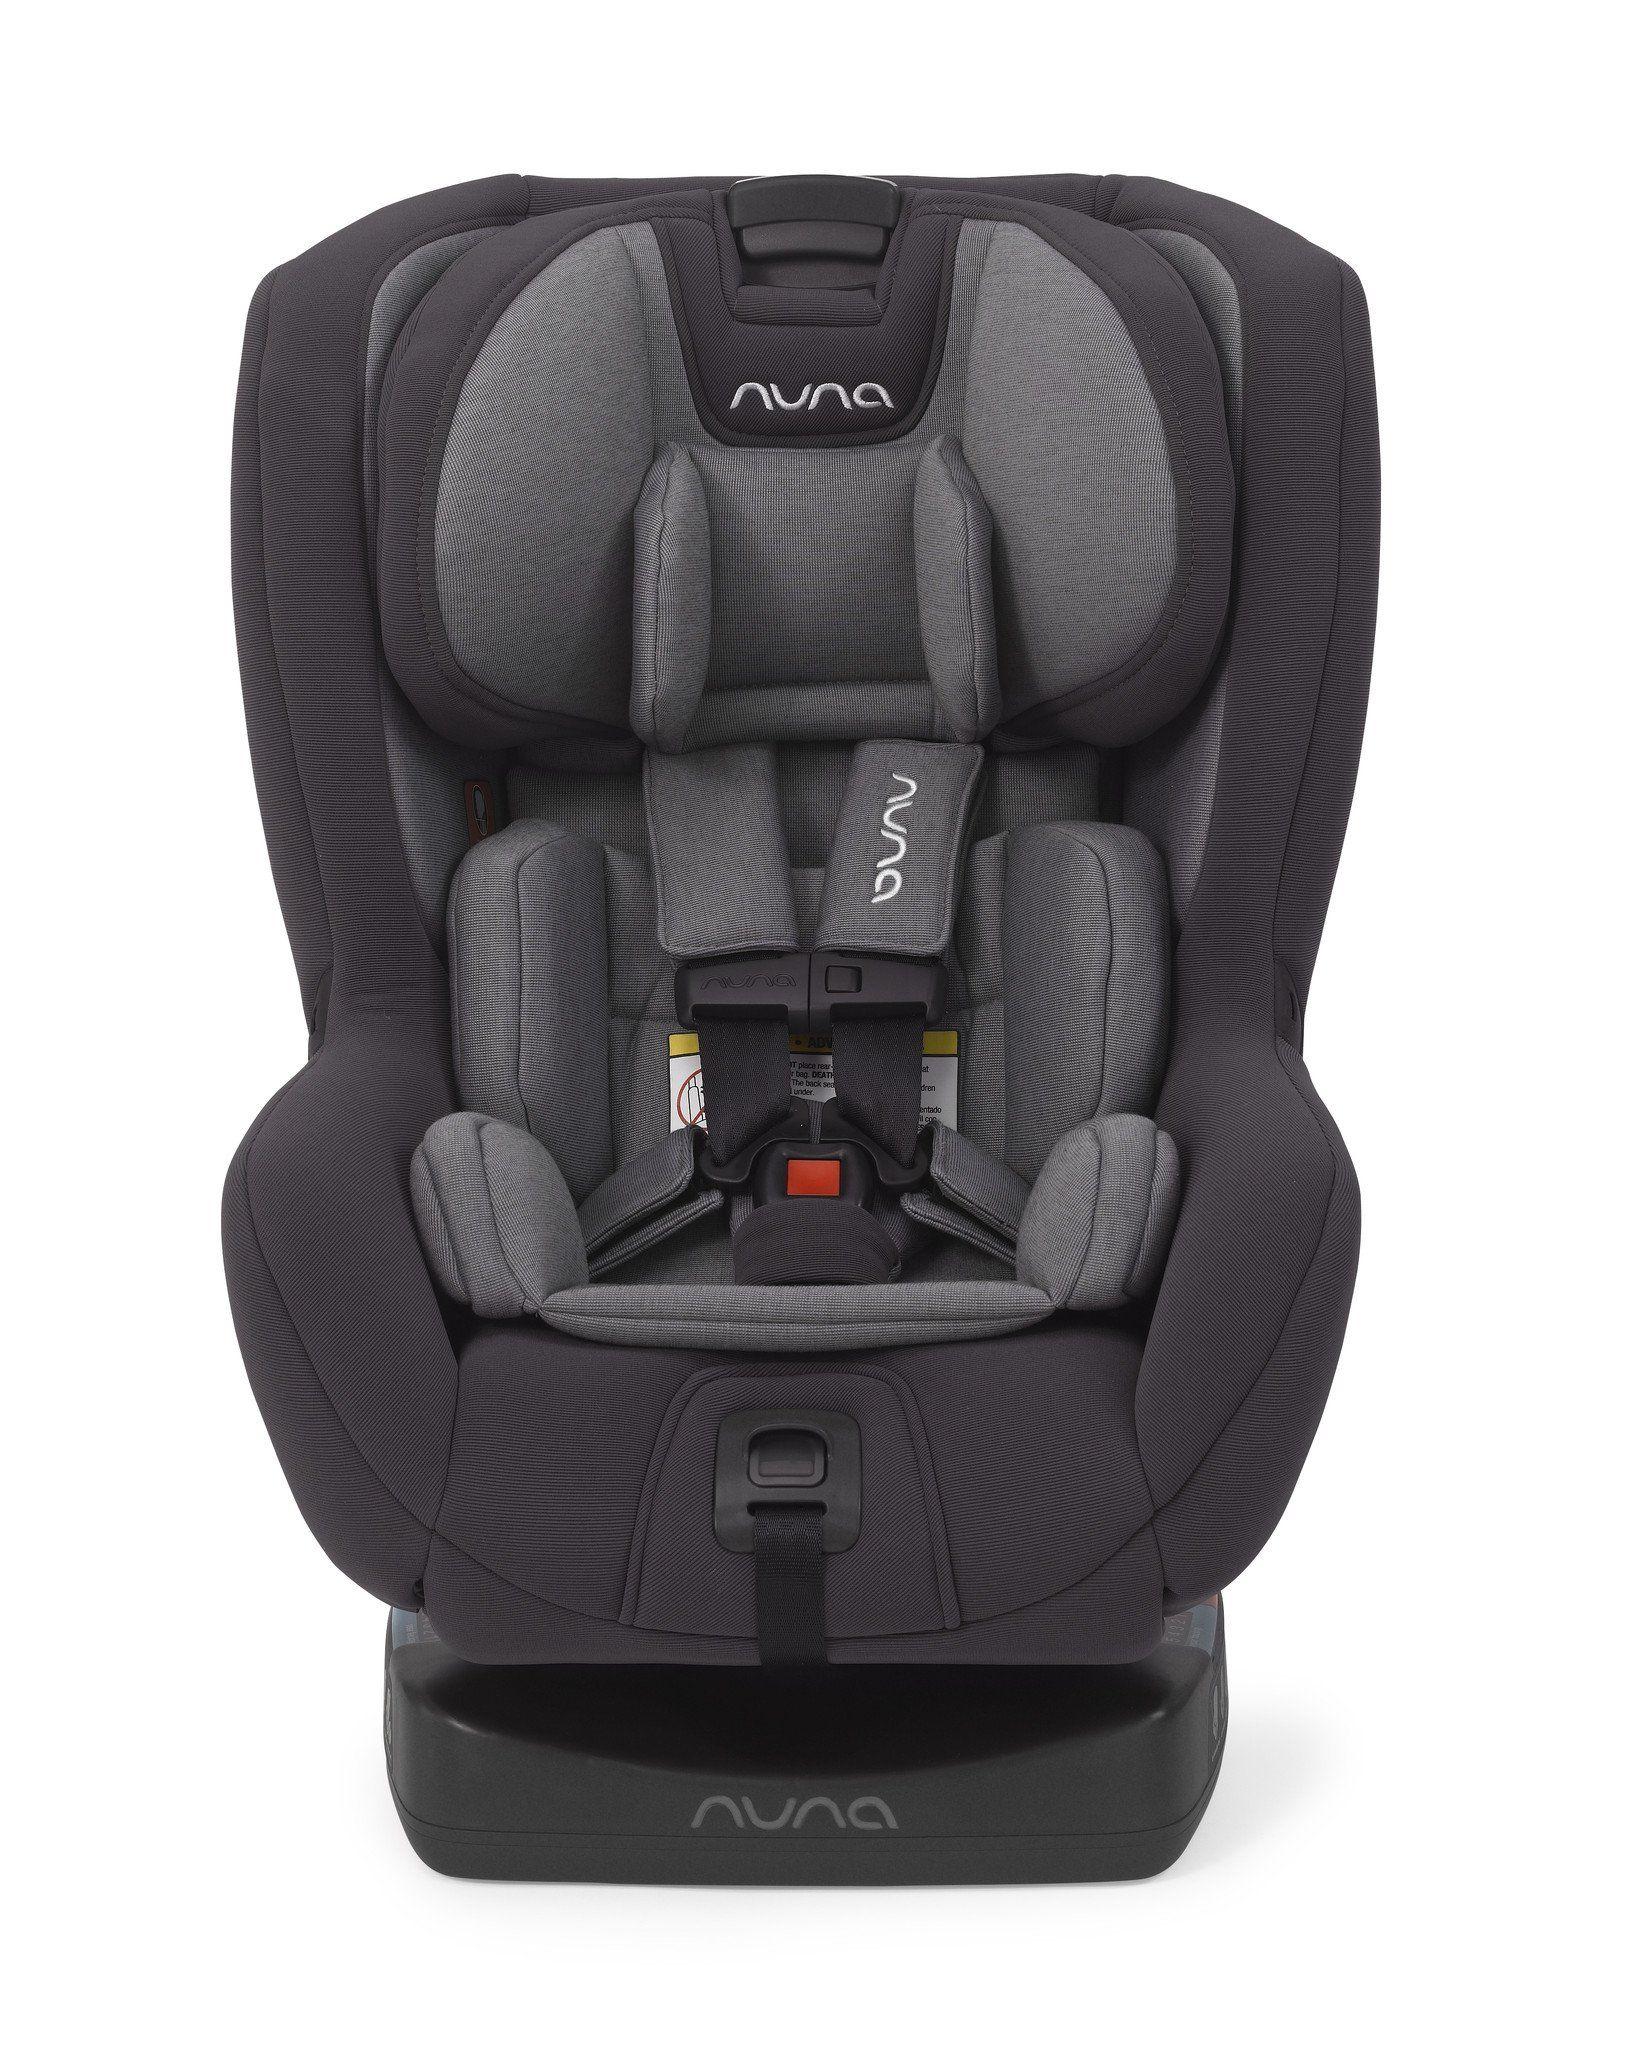 NUNA RAVA CONVERTIBLE CAR SEAT Car seats, Nuna car seat